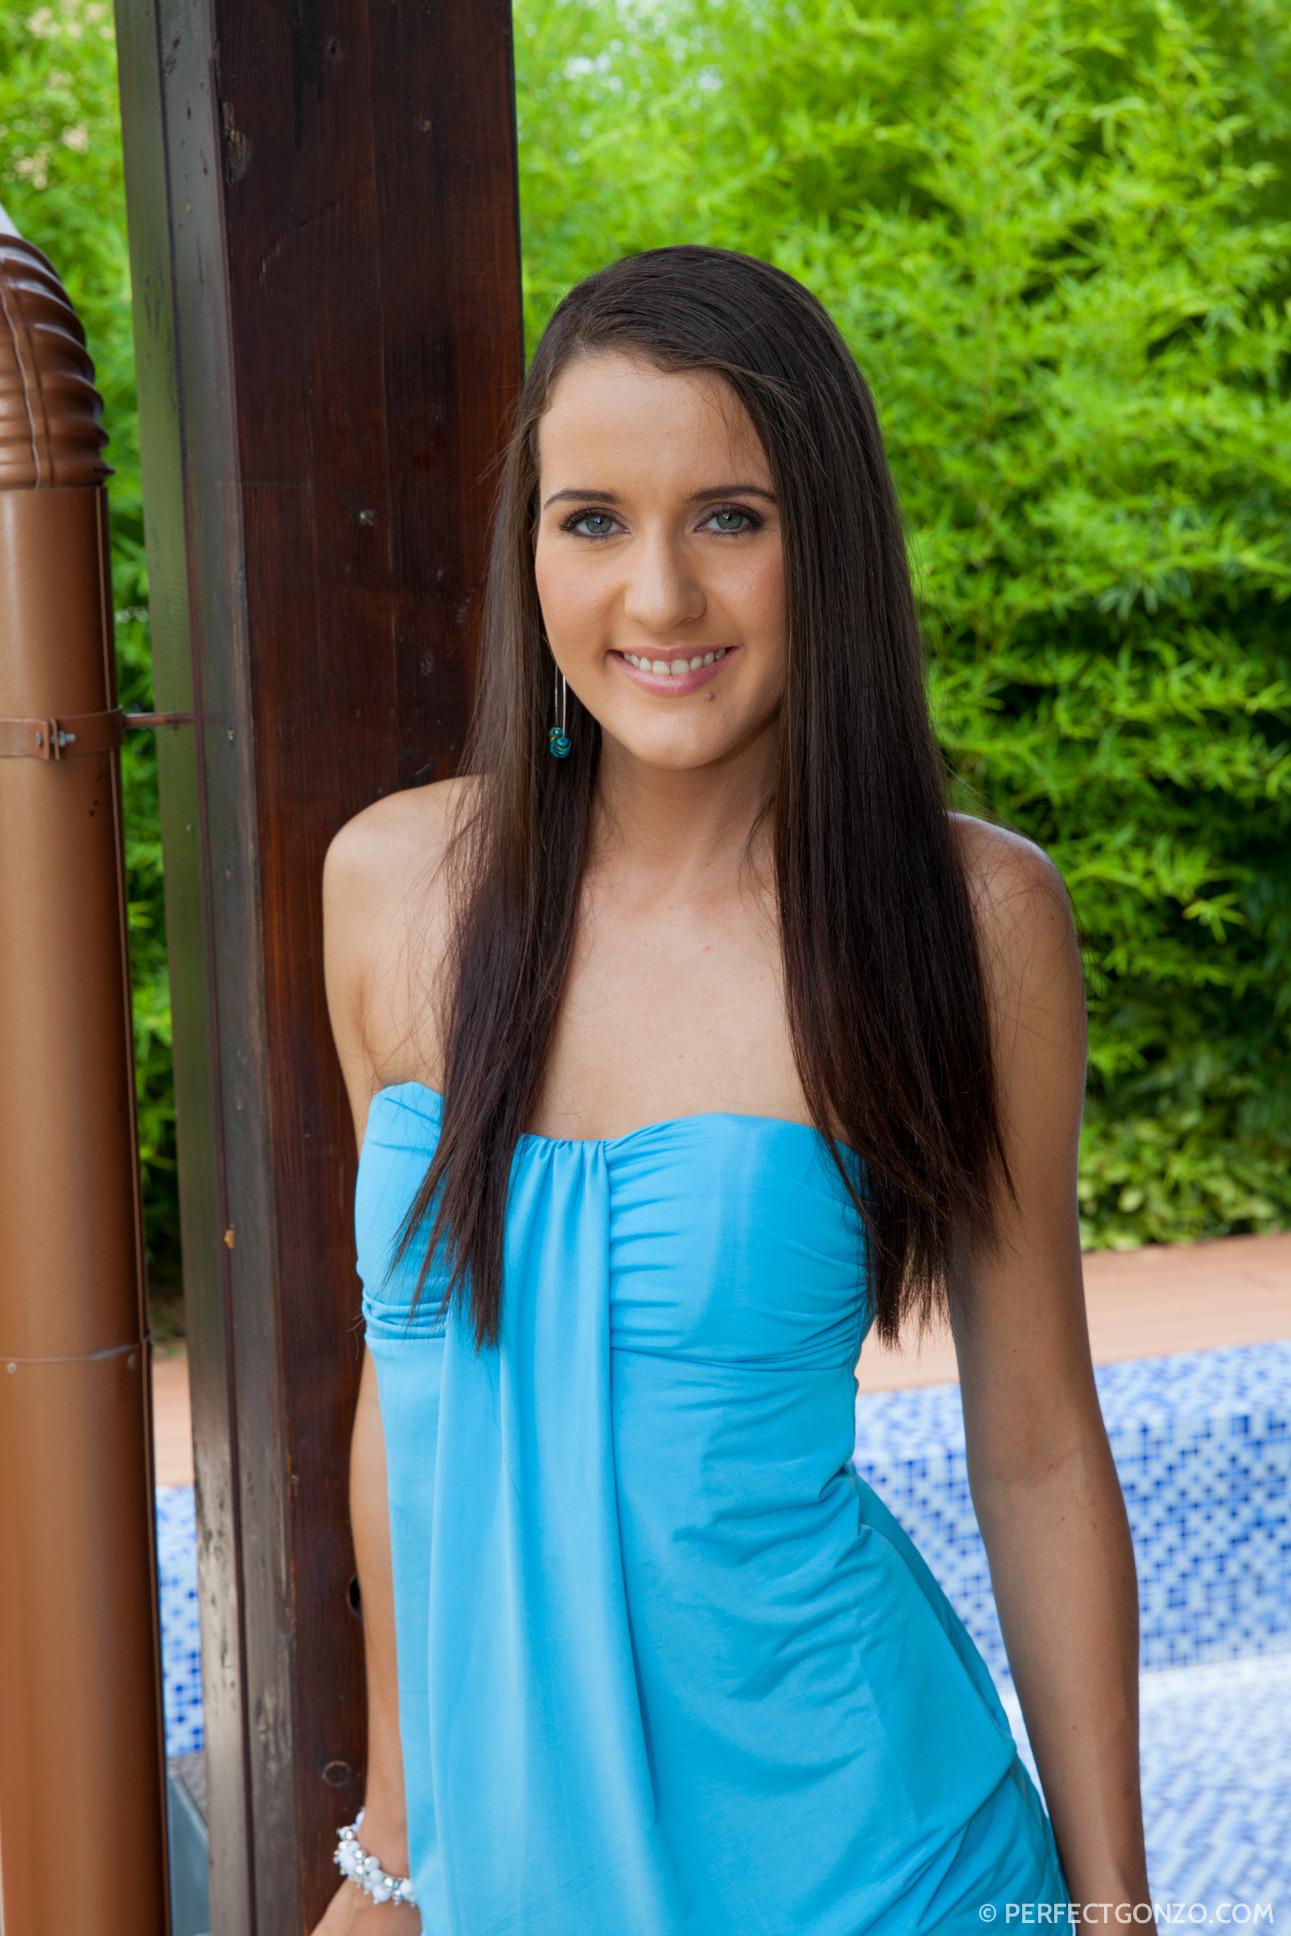 Adriana Perfectgonzo 84